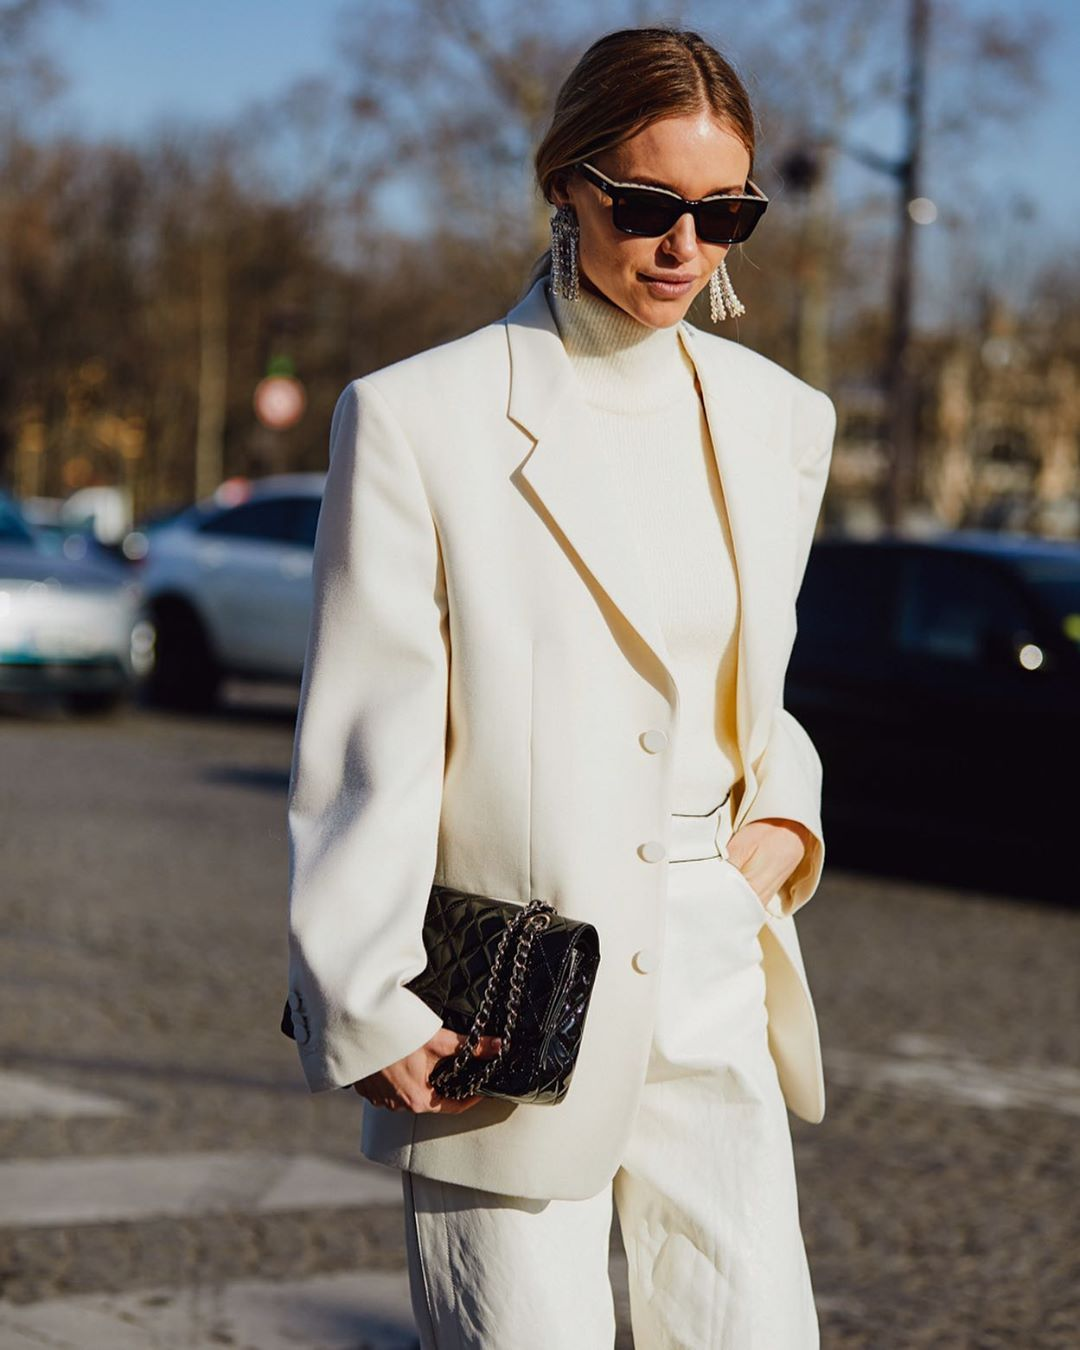 We Love a White Blazer for Spring